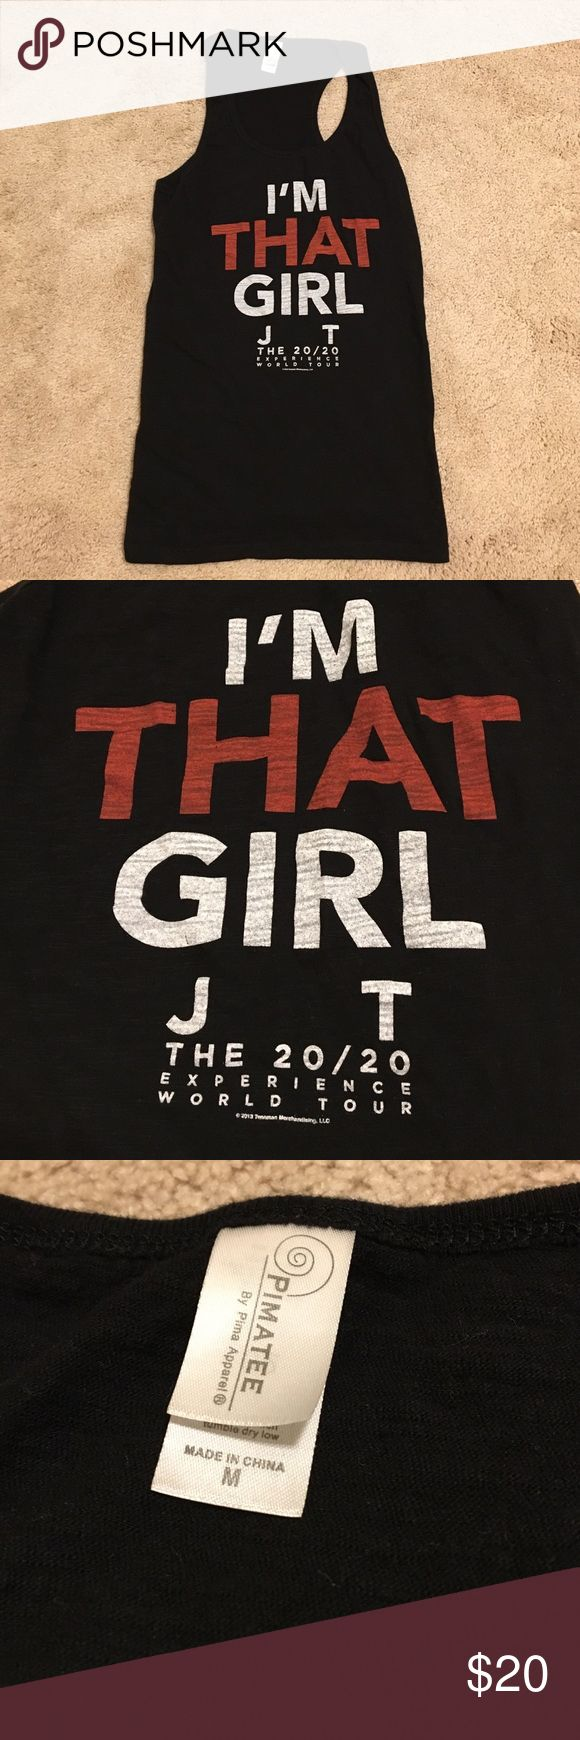 I'm that Girl Justin Timberlake Tank Black tank top from Justin Timberlake's The 20/20 Experience World Tour. I'm that girl. Size medium. Tops Tank Tops